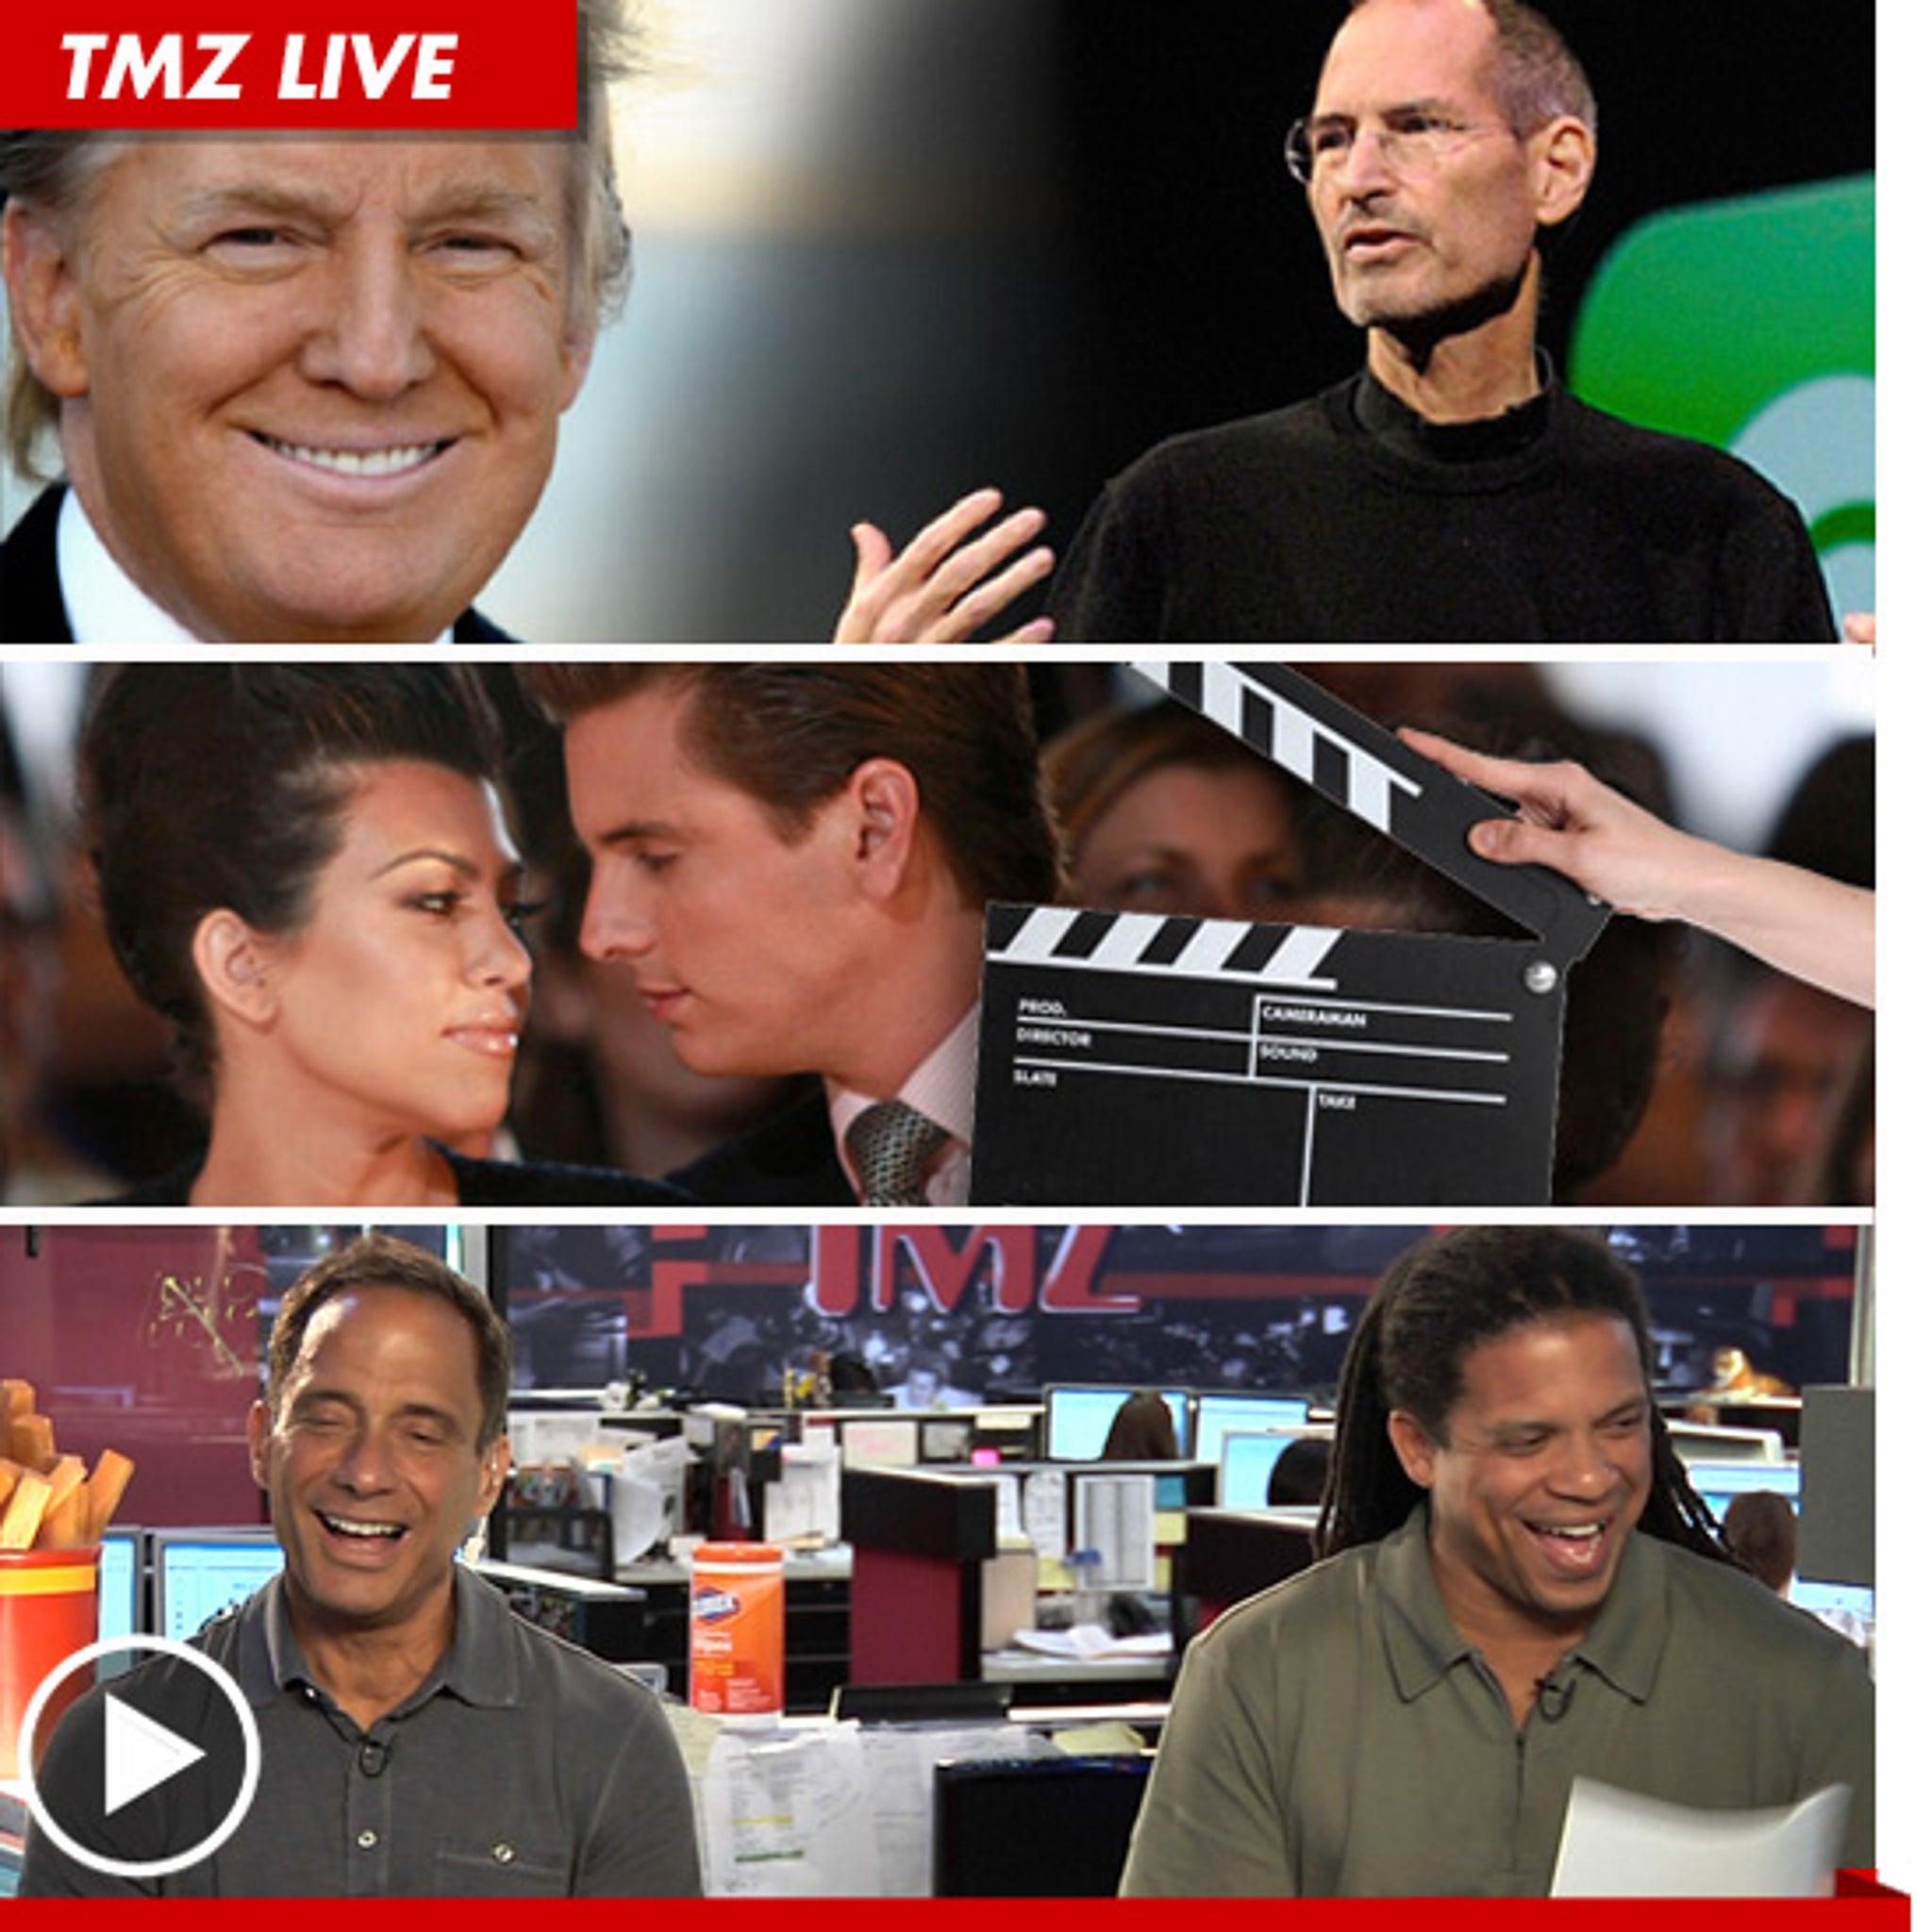 TMZ Live -- Donald Trump Interview: Steve Jobs 'Almost' Irreplaceable